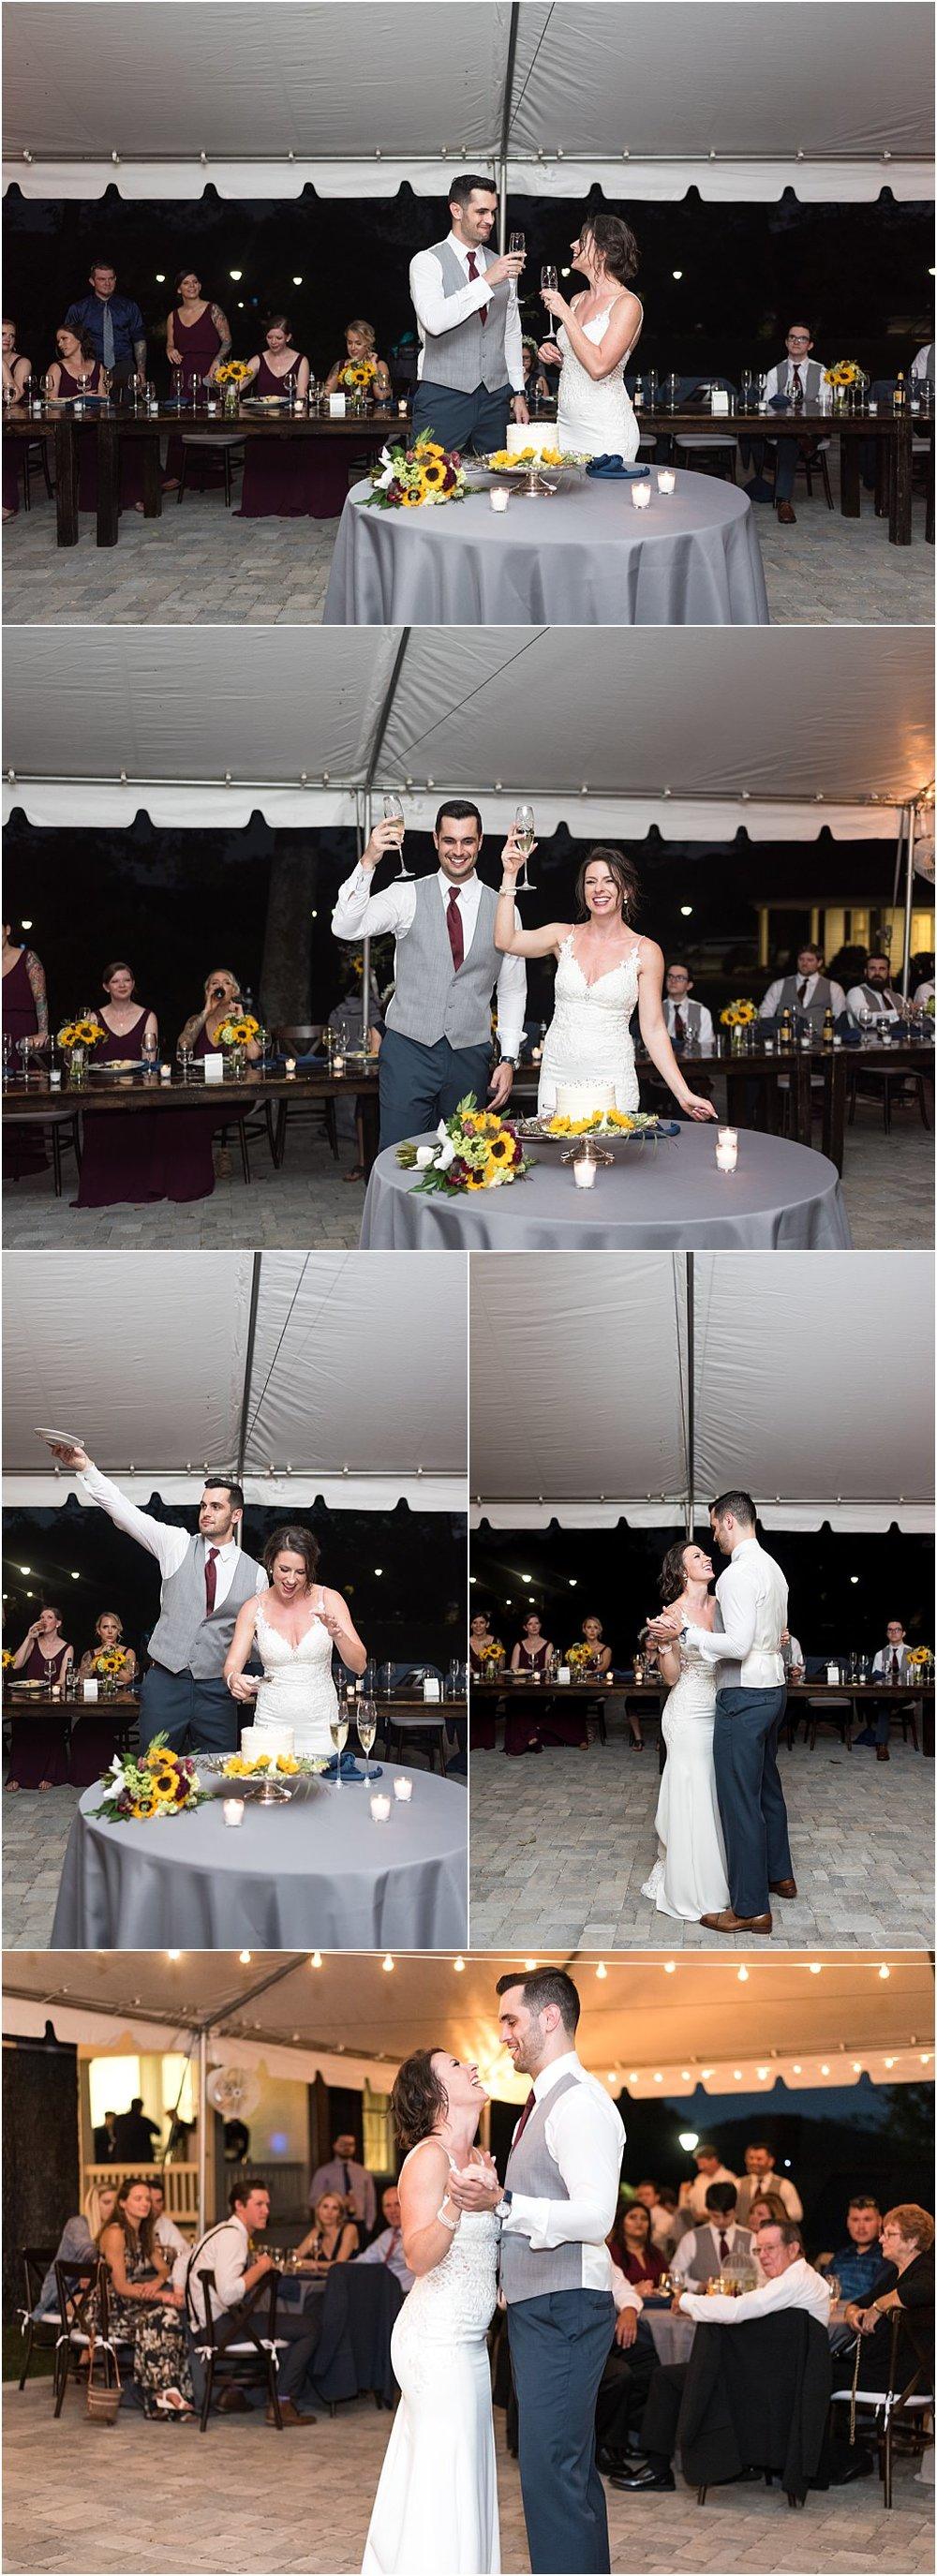 Jordan-and-Anna-Ravenswood-Mansion-Wedding-in-Brentwood-TN-Nashville-Wedding-Photographers+10